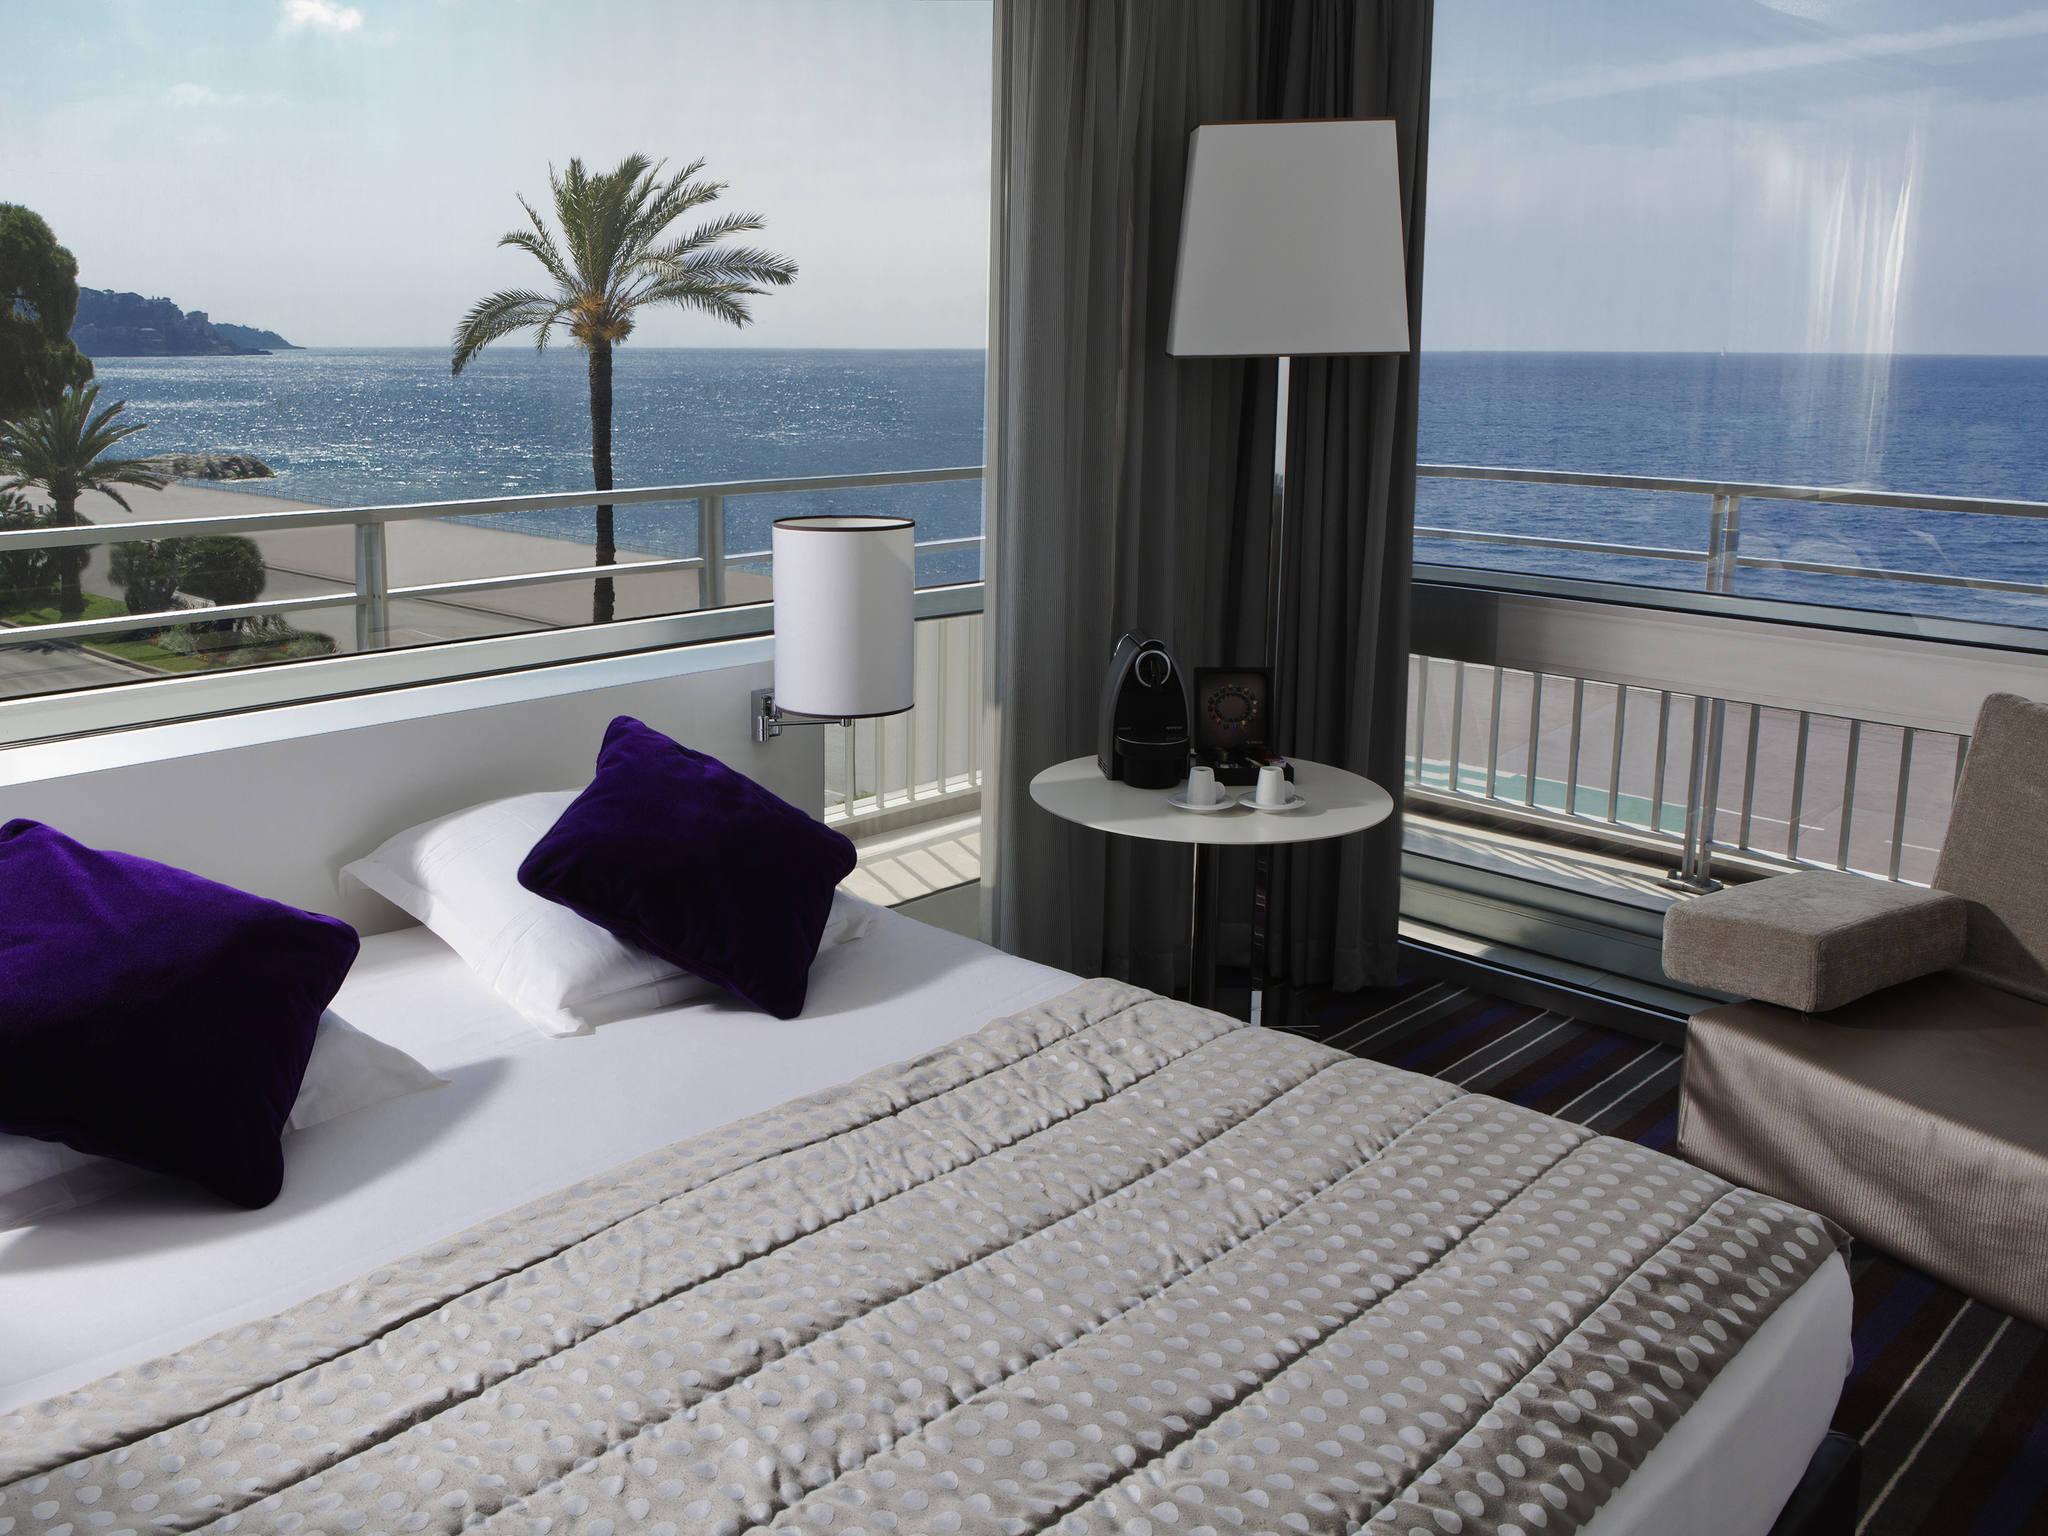 Hotel – Hôtel Mercure Nice Promenade des Anglais